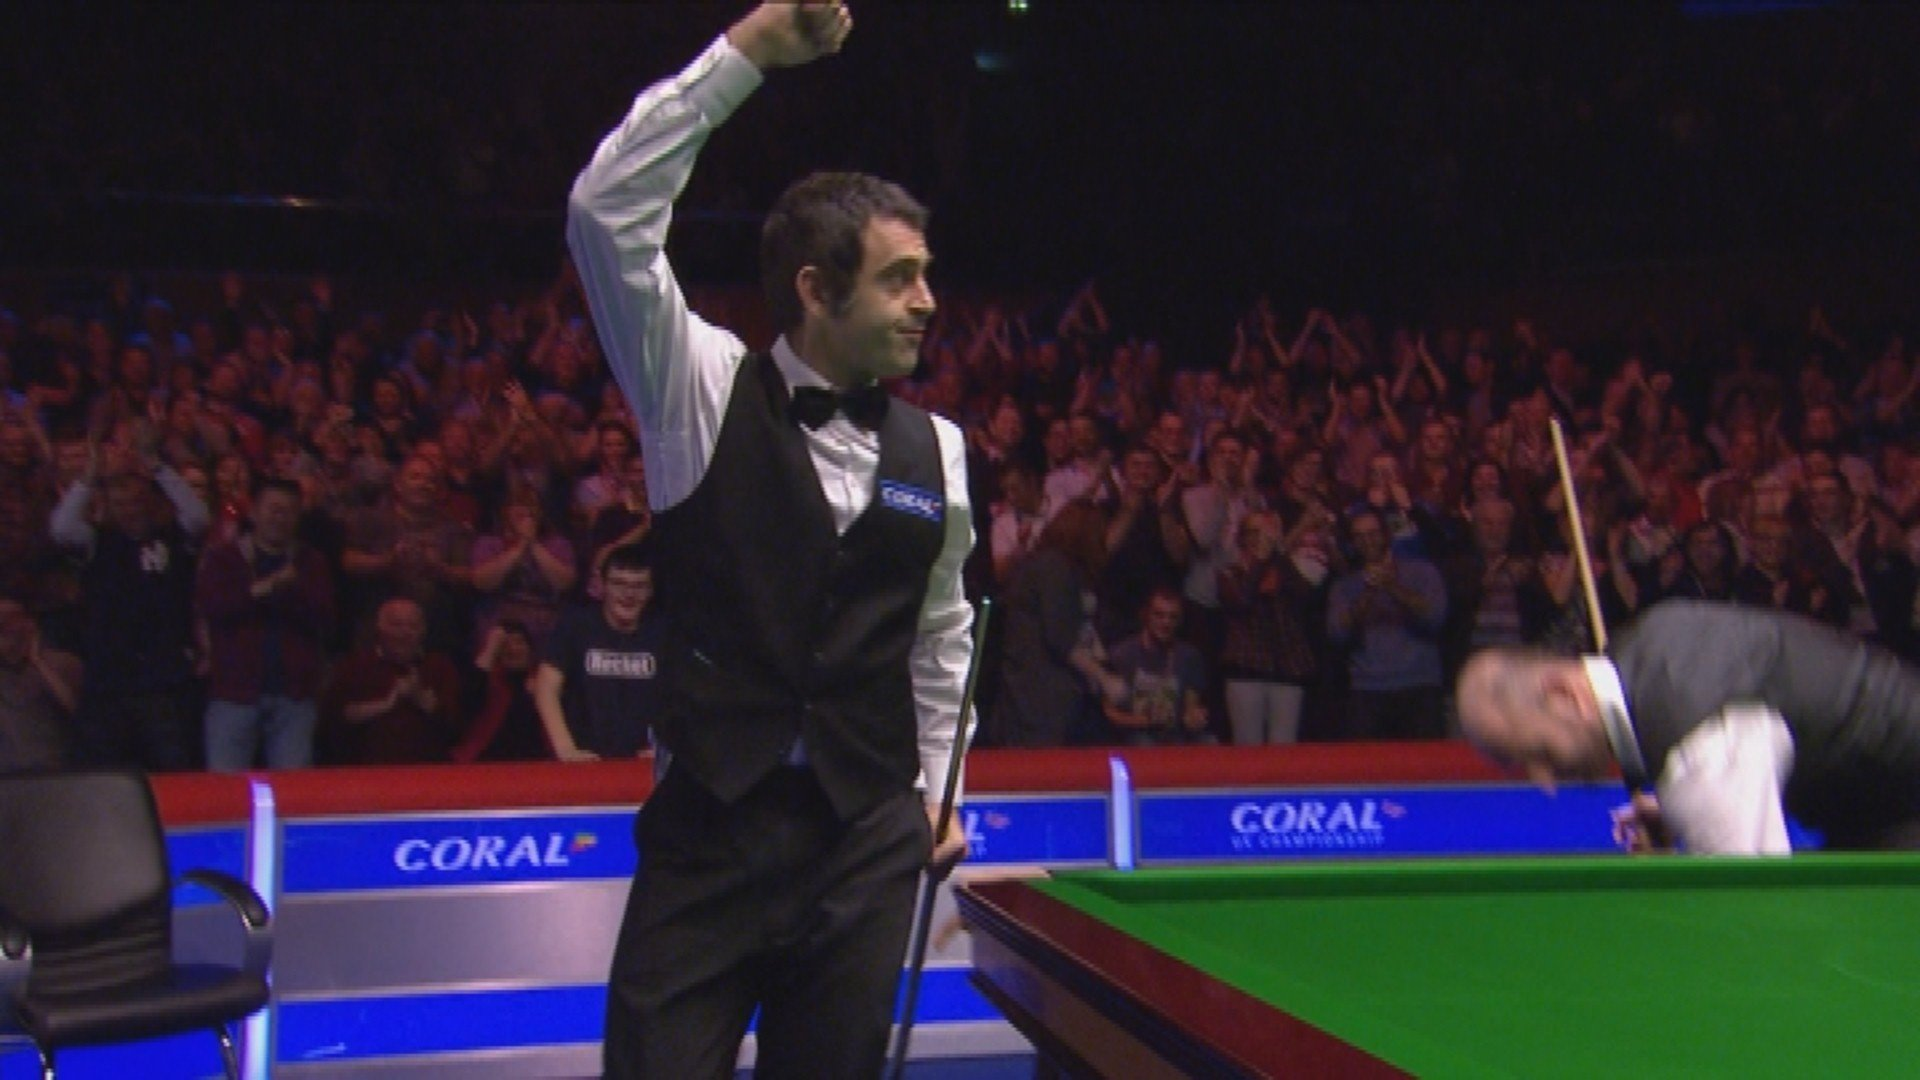 Ronnie O'Sullivan celebrates his 147